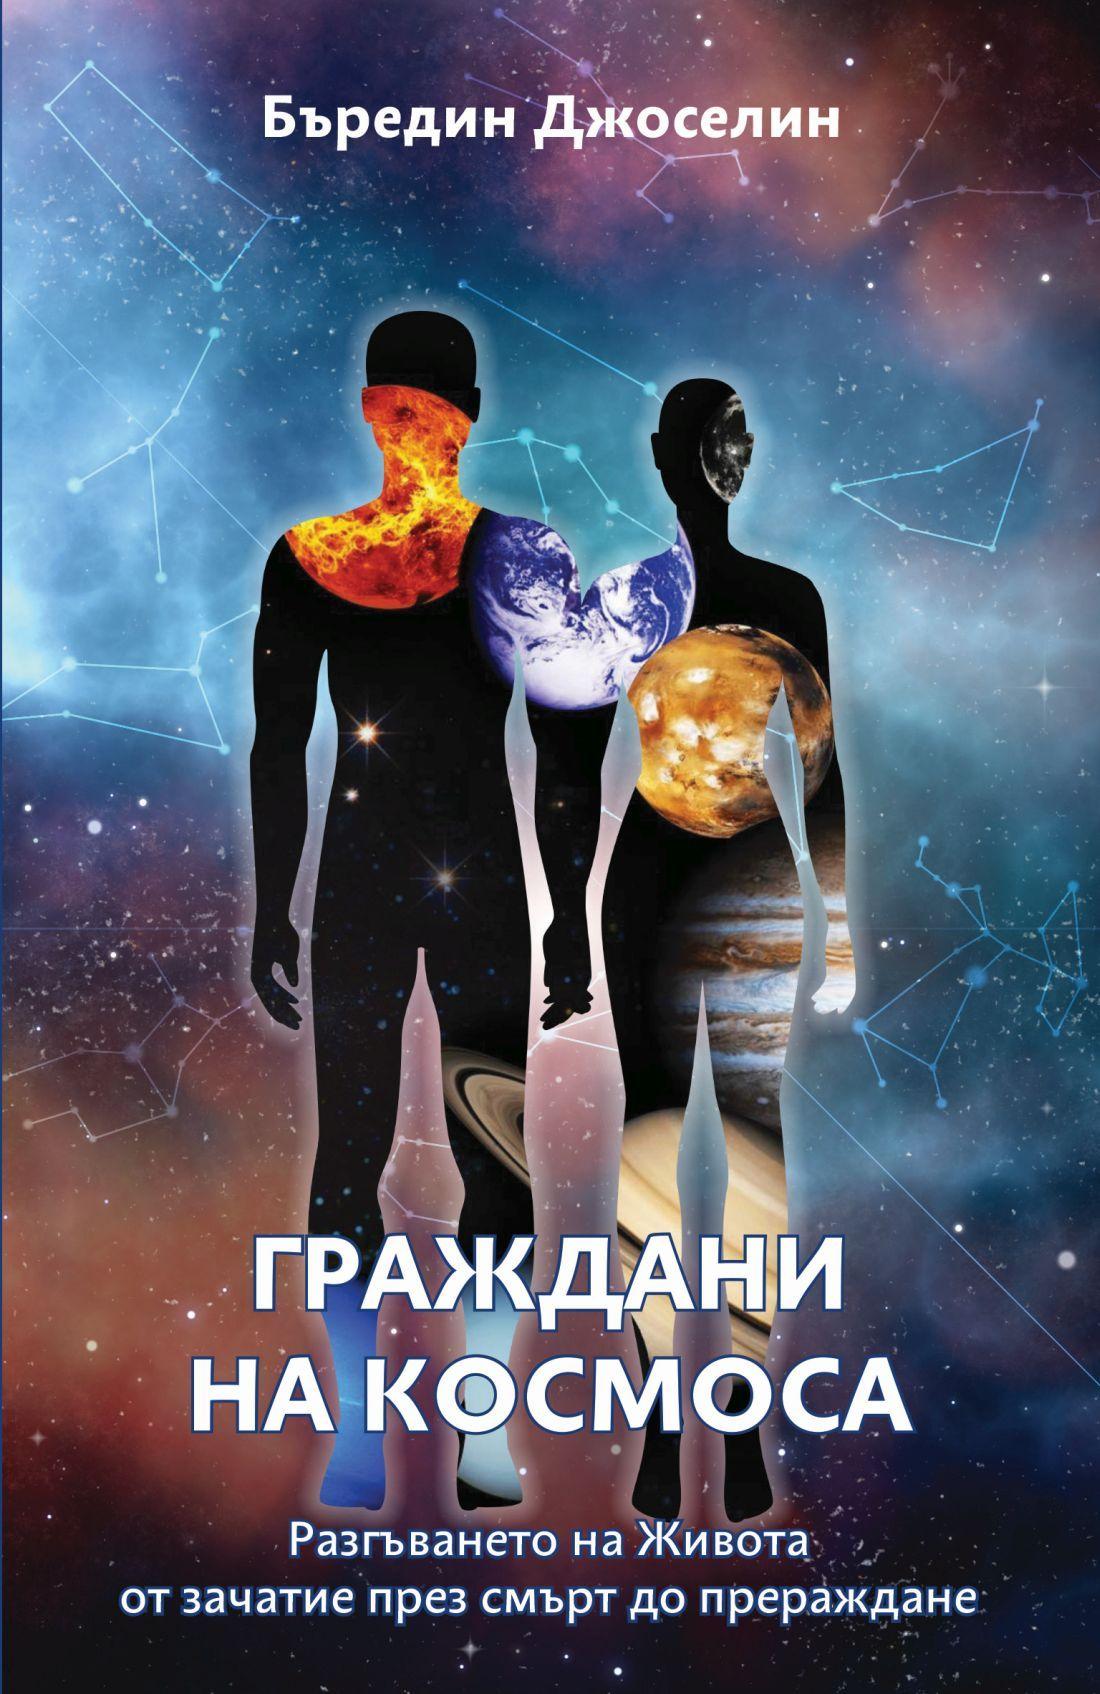 Граждани на космоса - 1